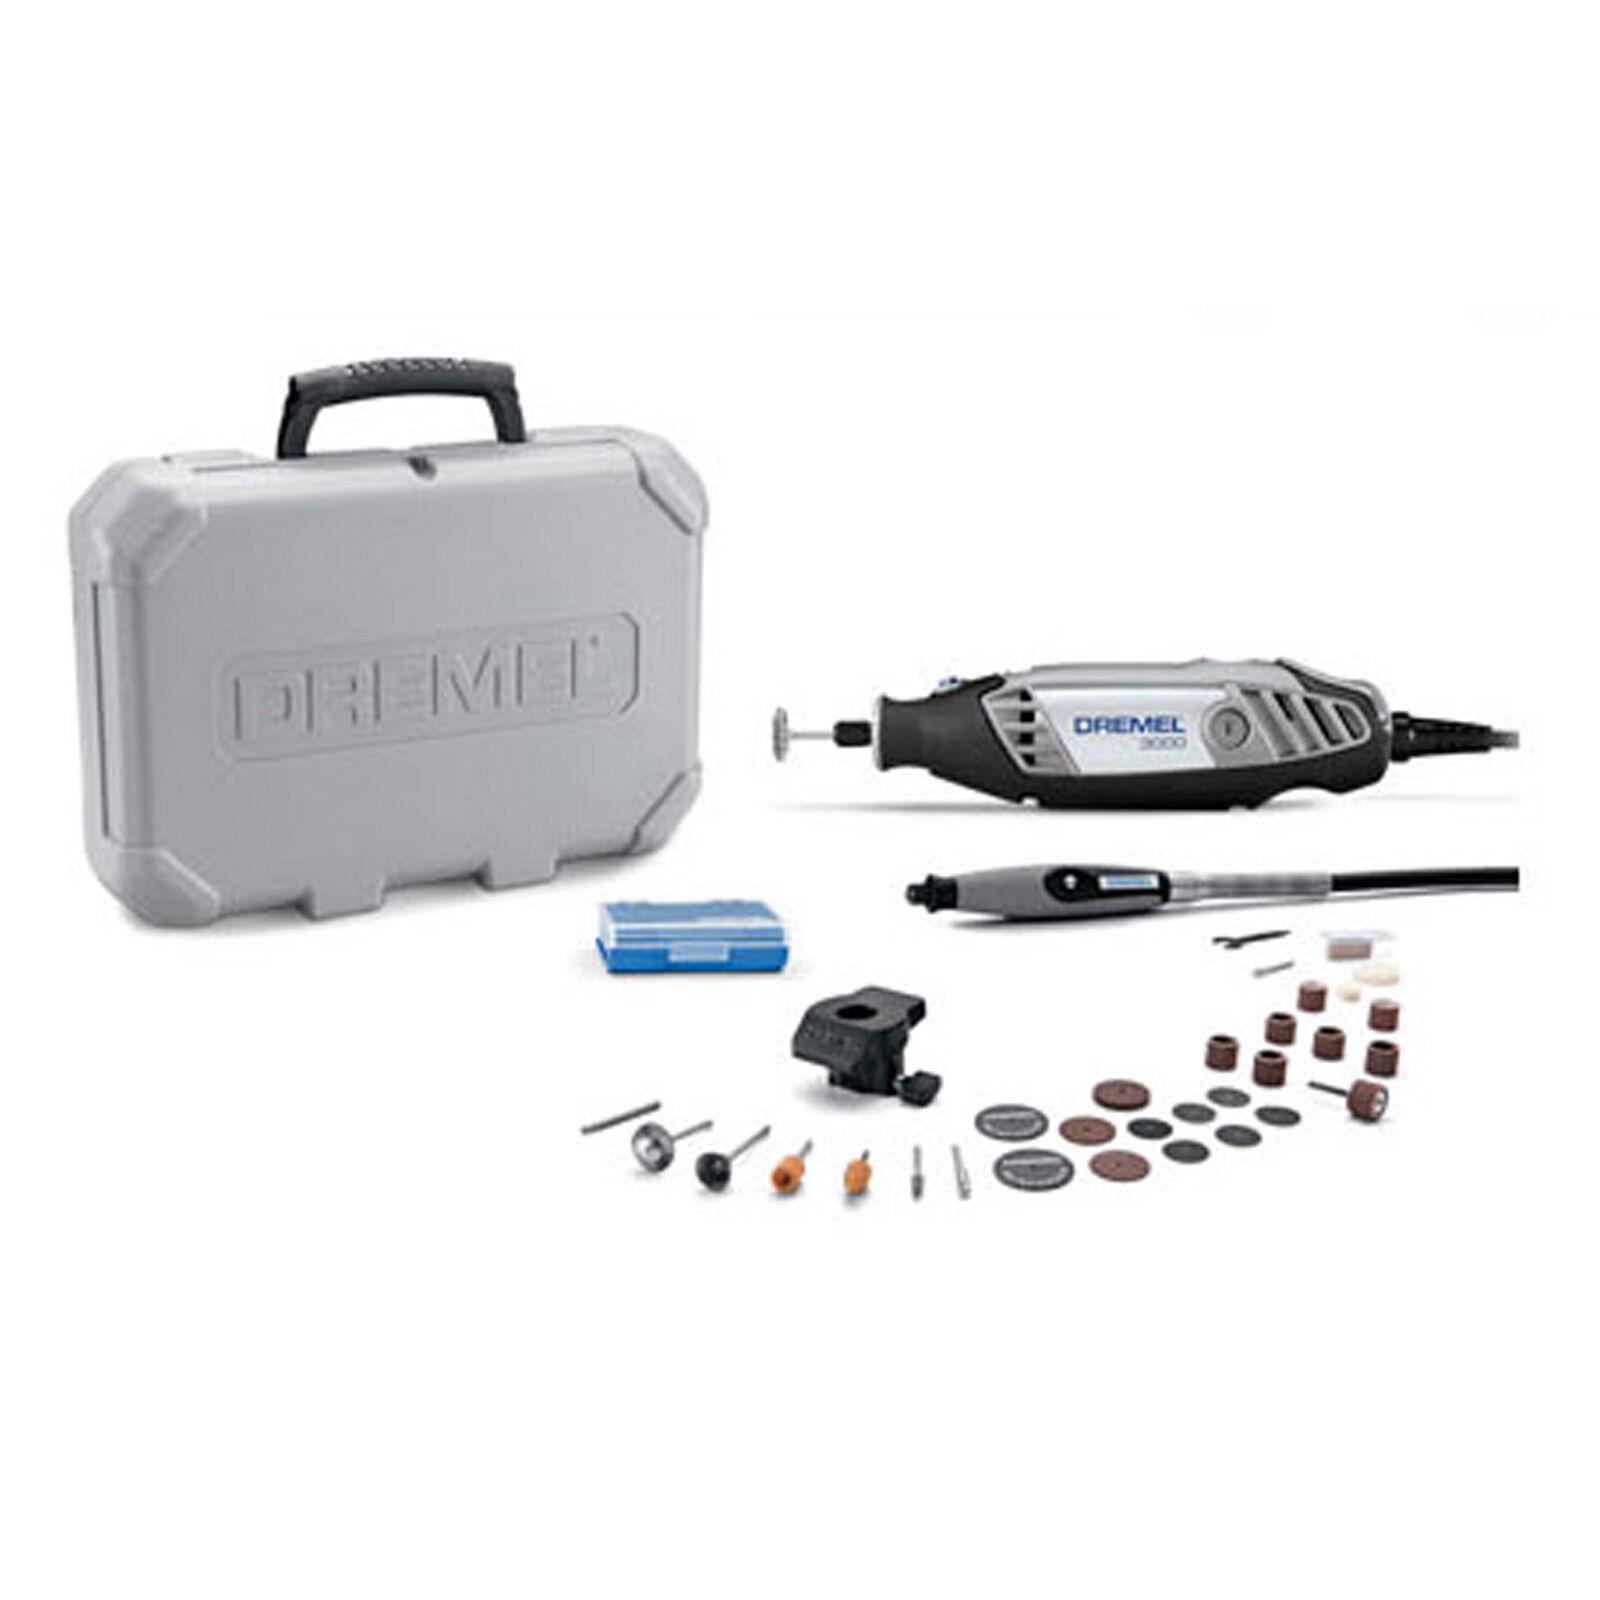 DREMEL 3000-2 30 Versatile sinker Kit redary Tool Electric Grinder 220V 37000RPM